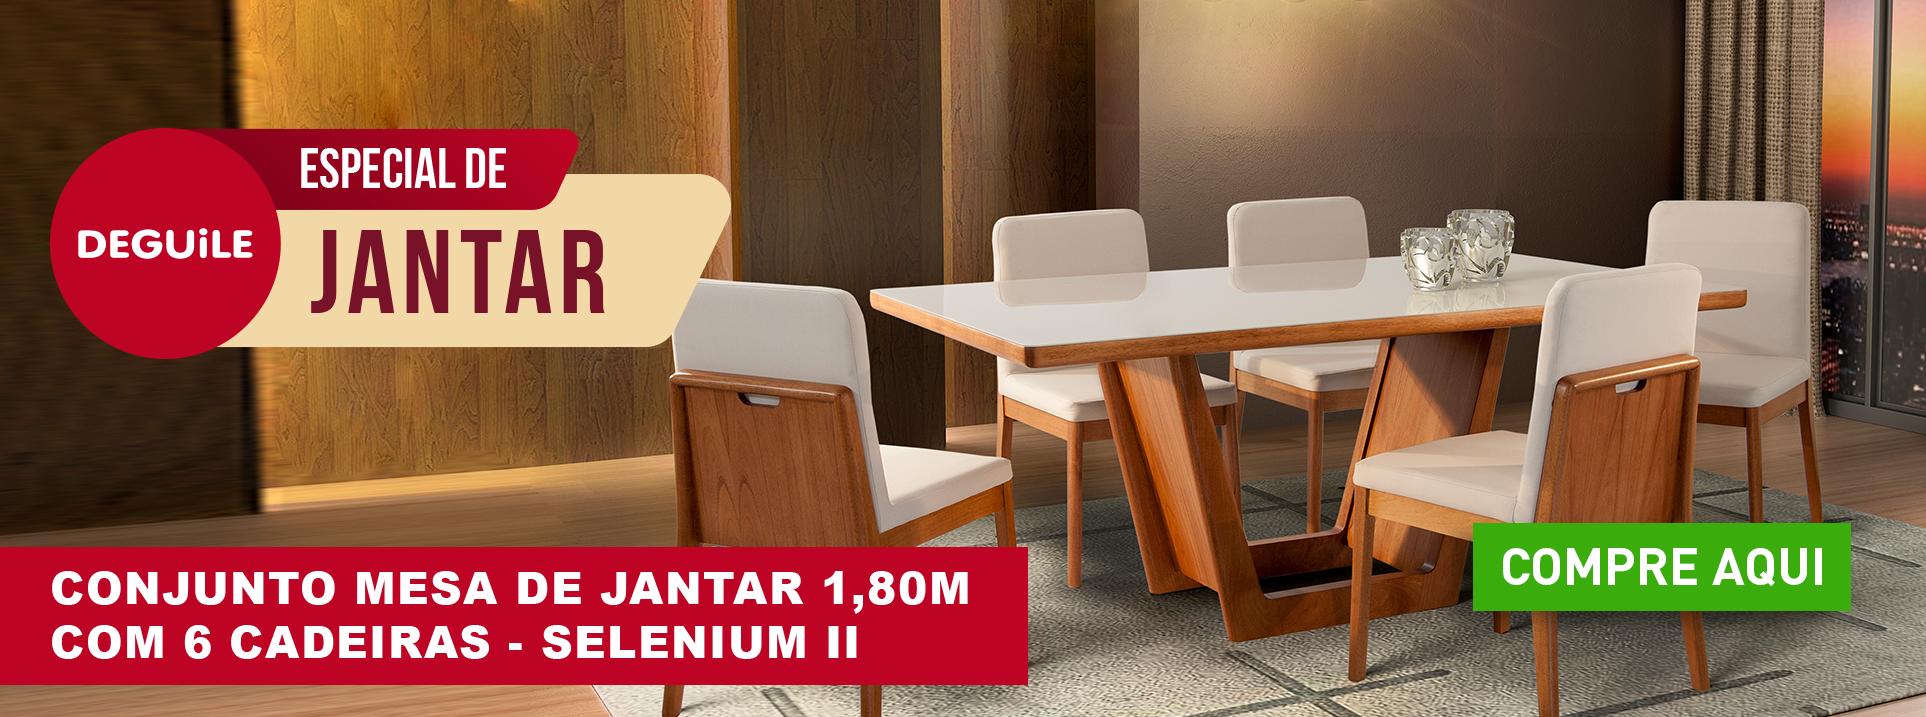 Conjunto Mesa de Jantar 1,80m com 6 cadeiras - SELENIUM II